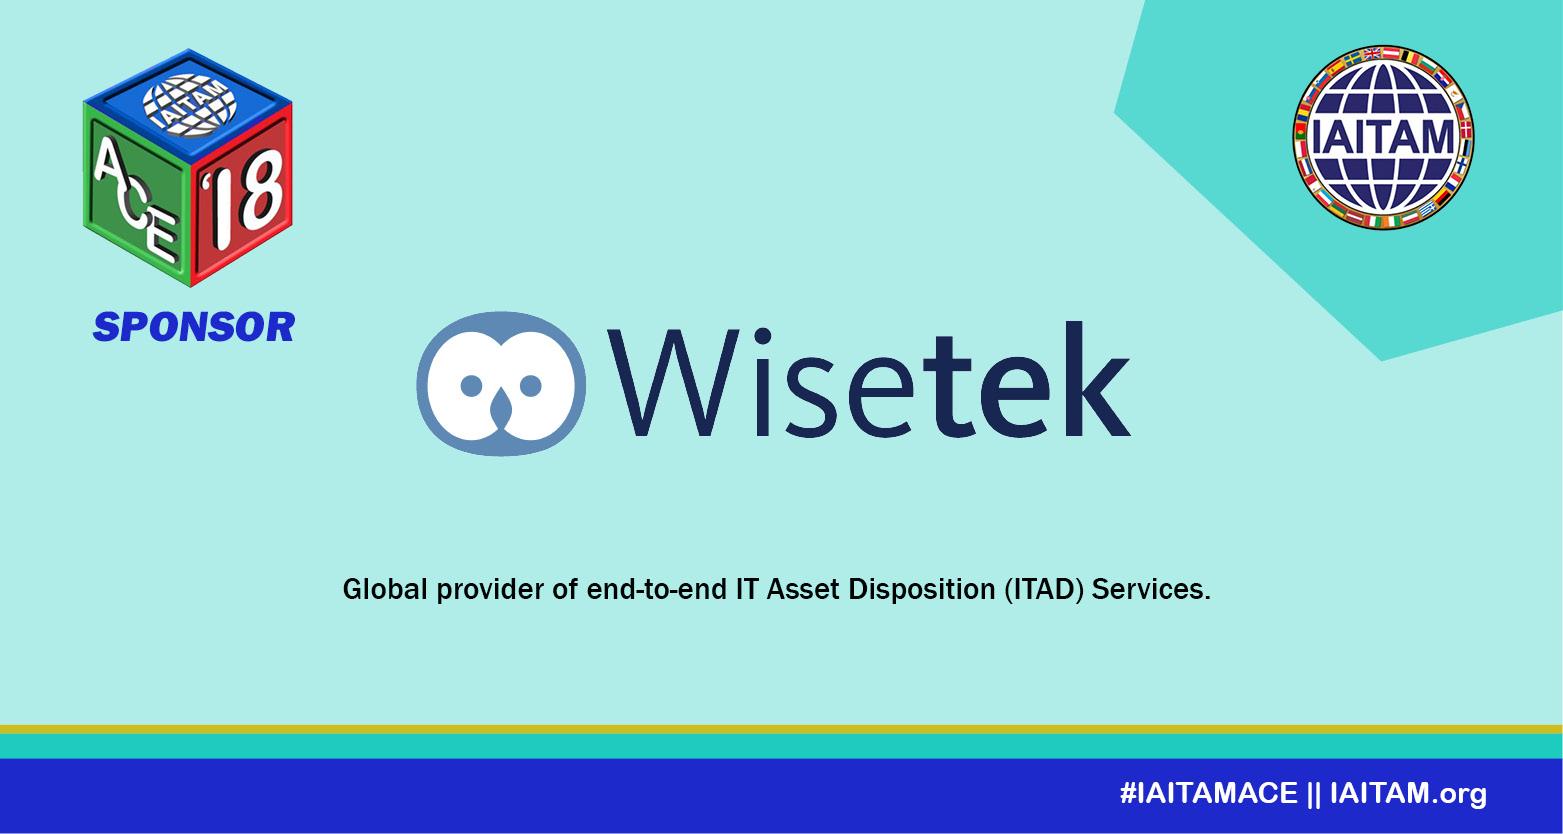 Thank you Wisetek, Sponsor at the IAITAM ACE!